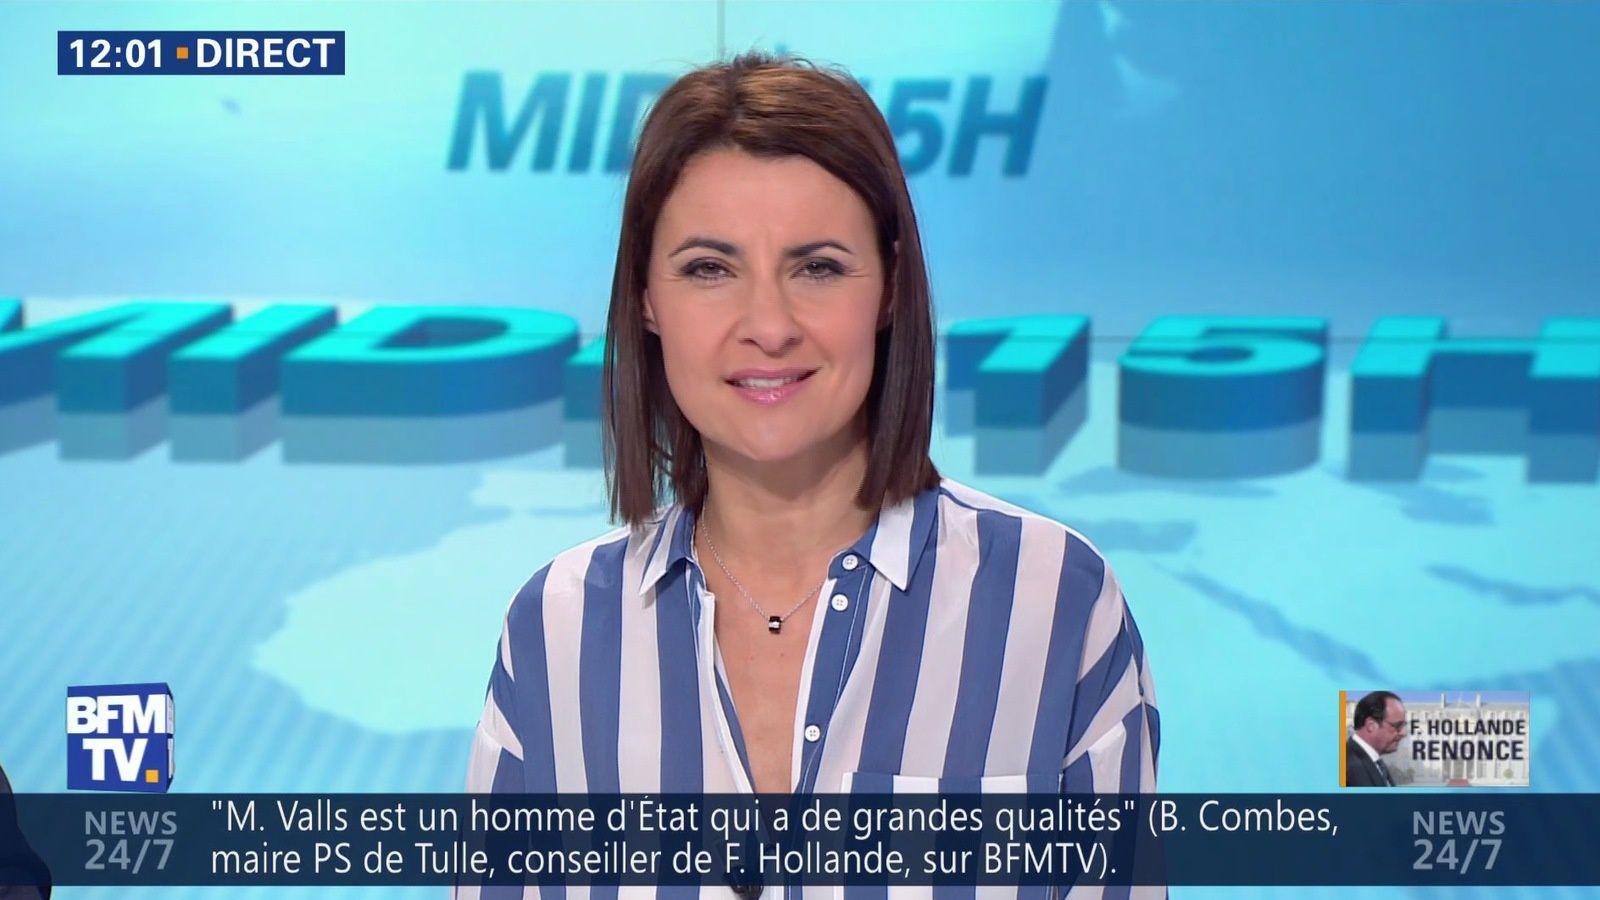 📸 SANDRA GANDOIN @SandraGandoin @JohannaCarlosD8 cet apm @BFMTV #vuesalatele